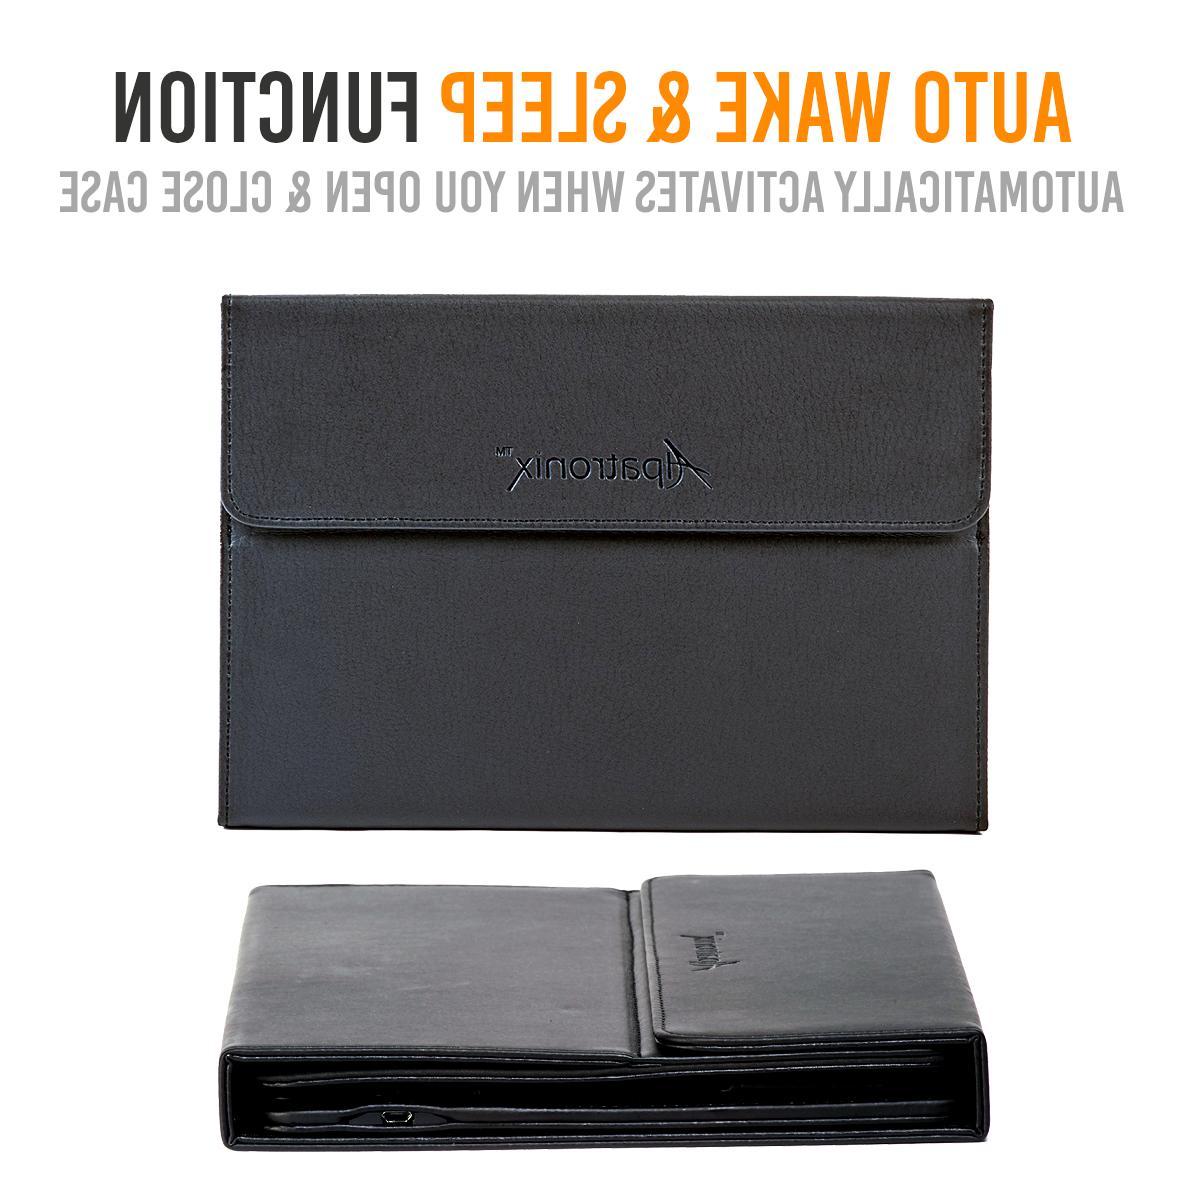 iPad Pro Keyboard Wireless Detachable Leather